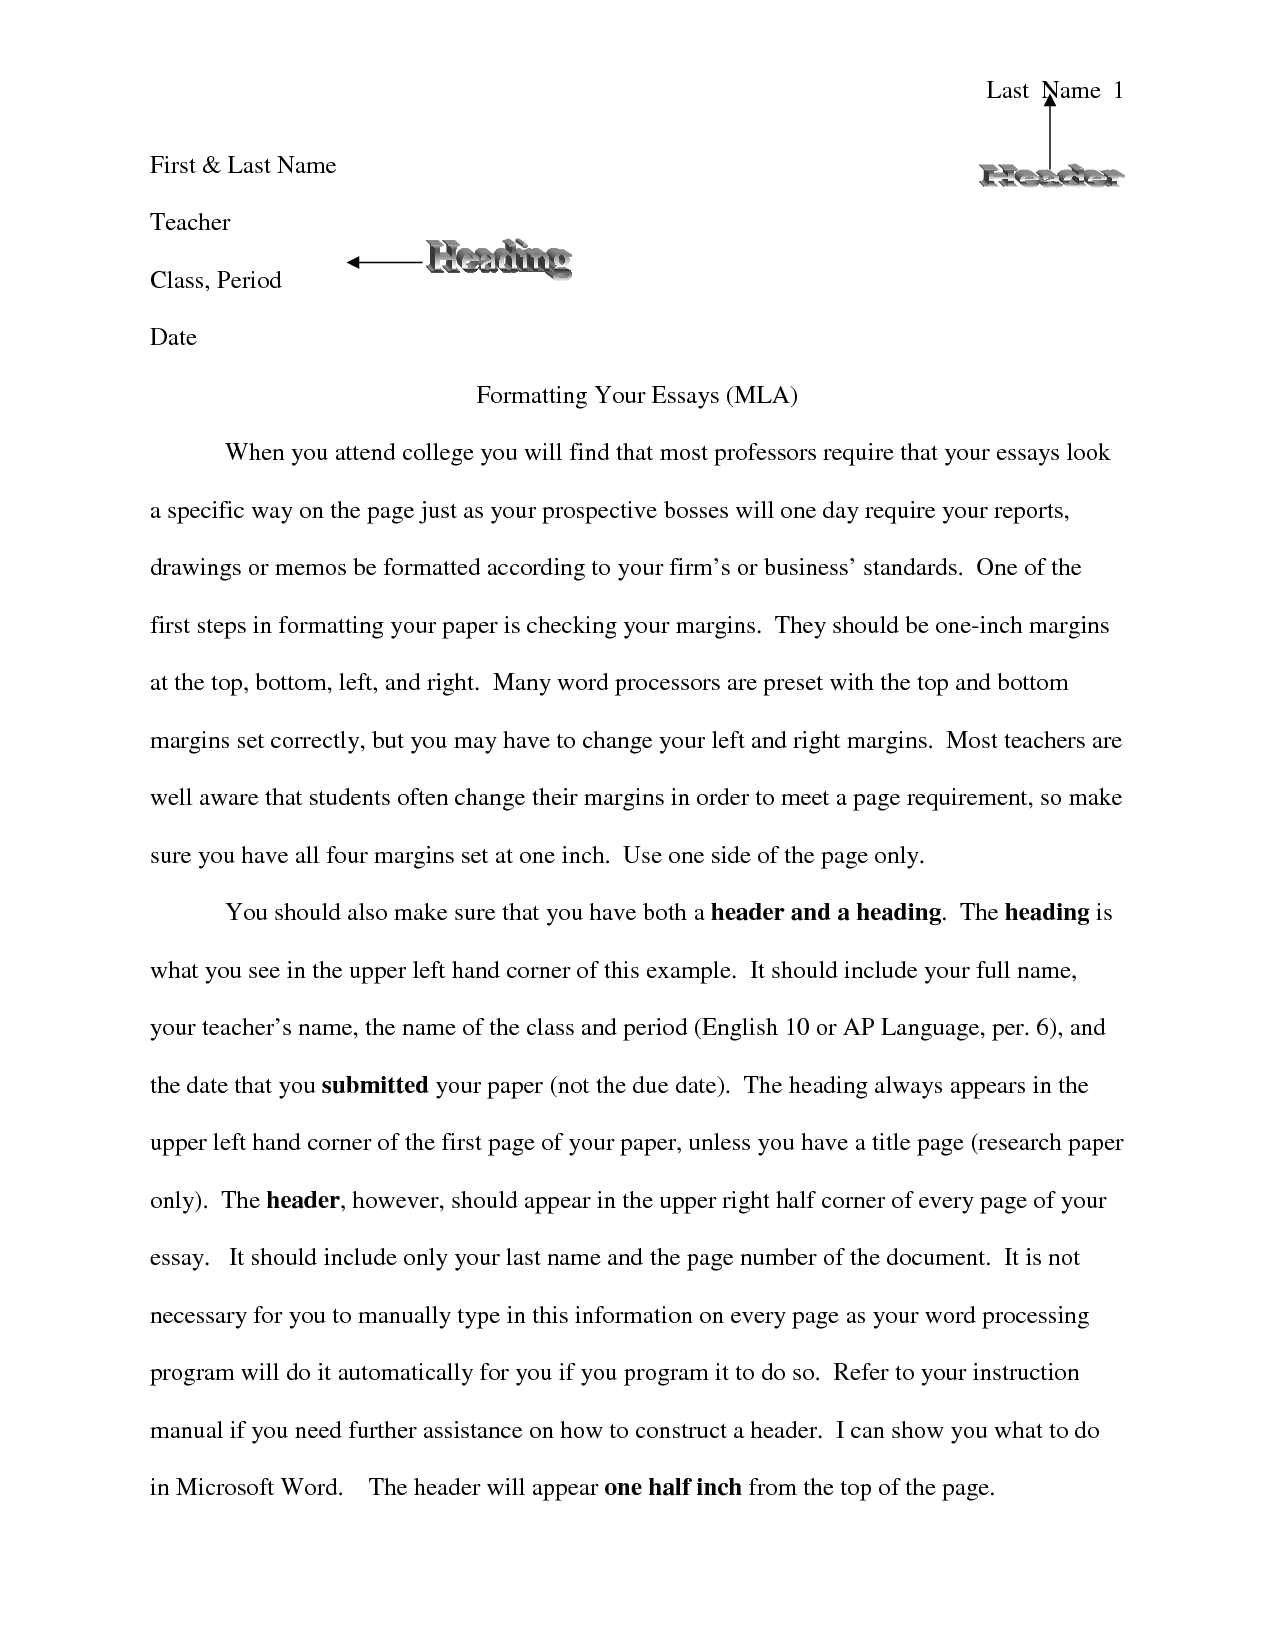 003 College Essay Format Template Nnftftofsn Stirring Admission Full